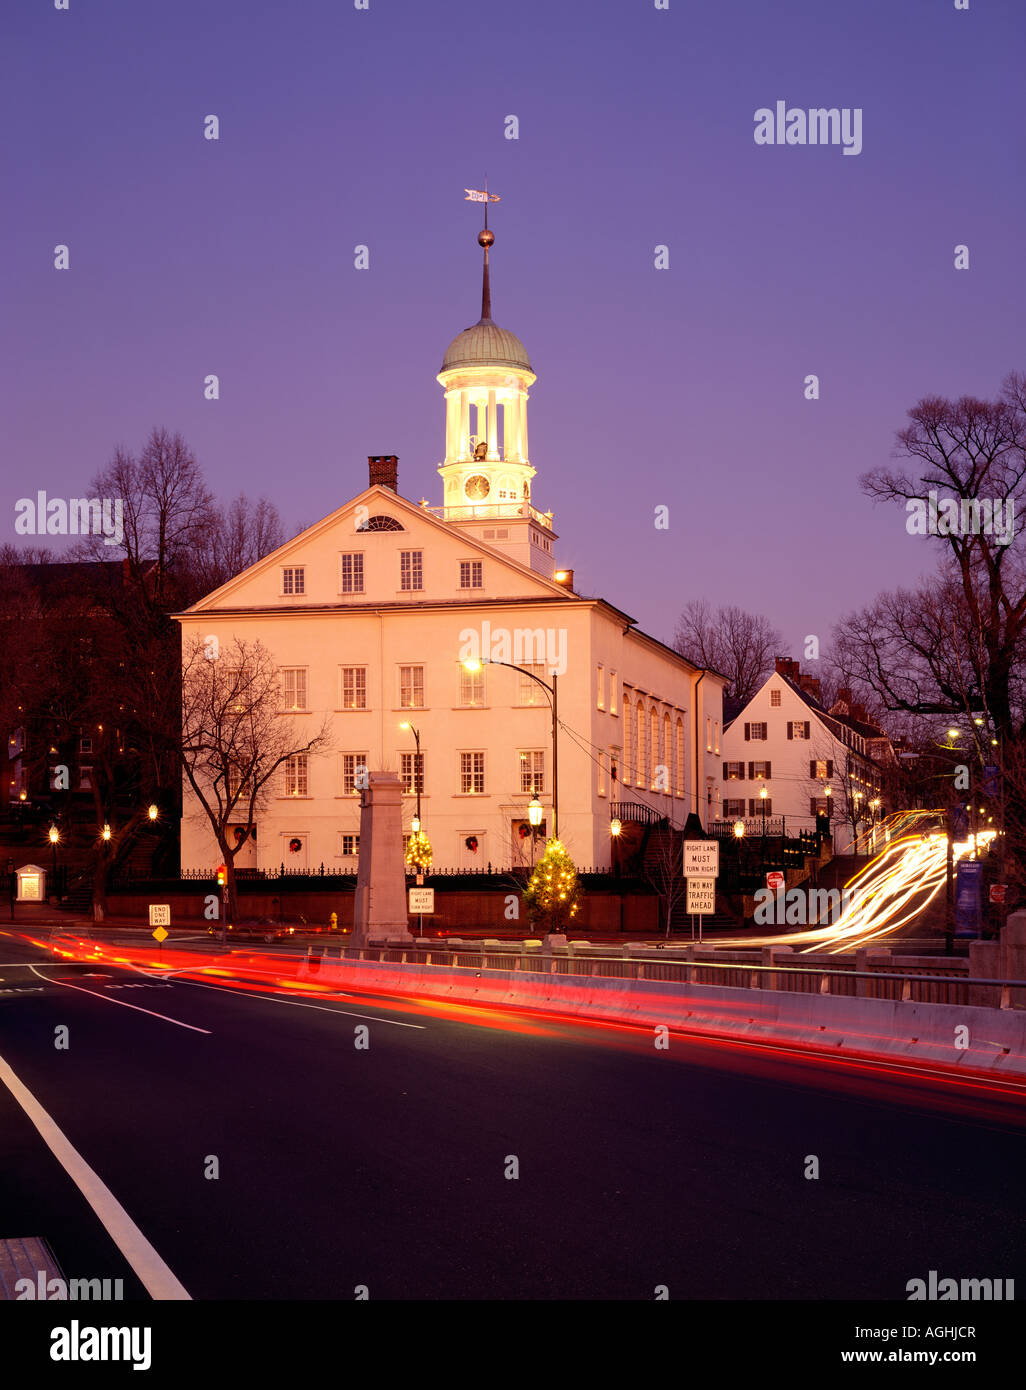 Moravian Community Church Lit For Christmas, Bethlehem, Northampton County, Pennsylvania, USA - Stock Image